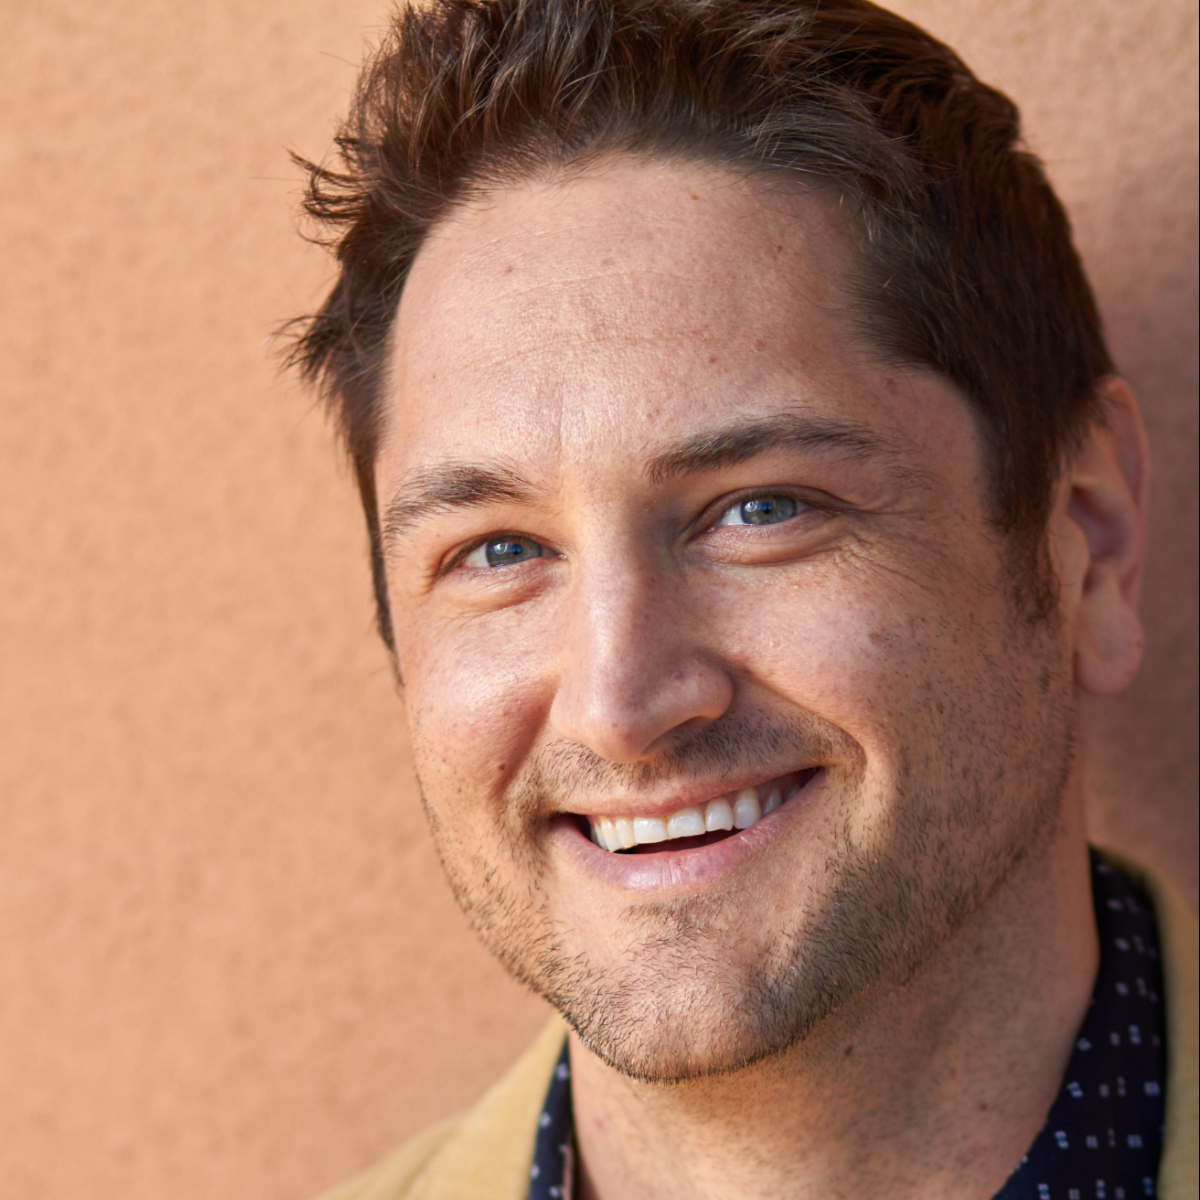 David Metzler, CEO of CBDCapitalGroup